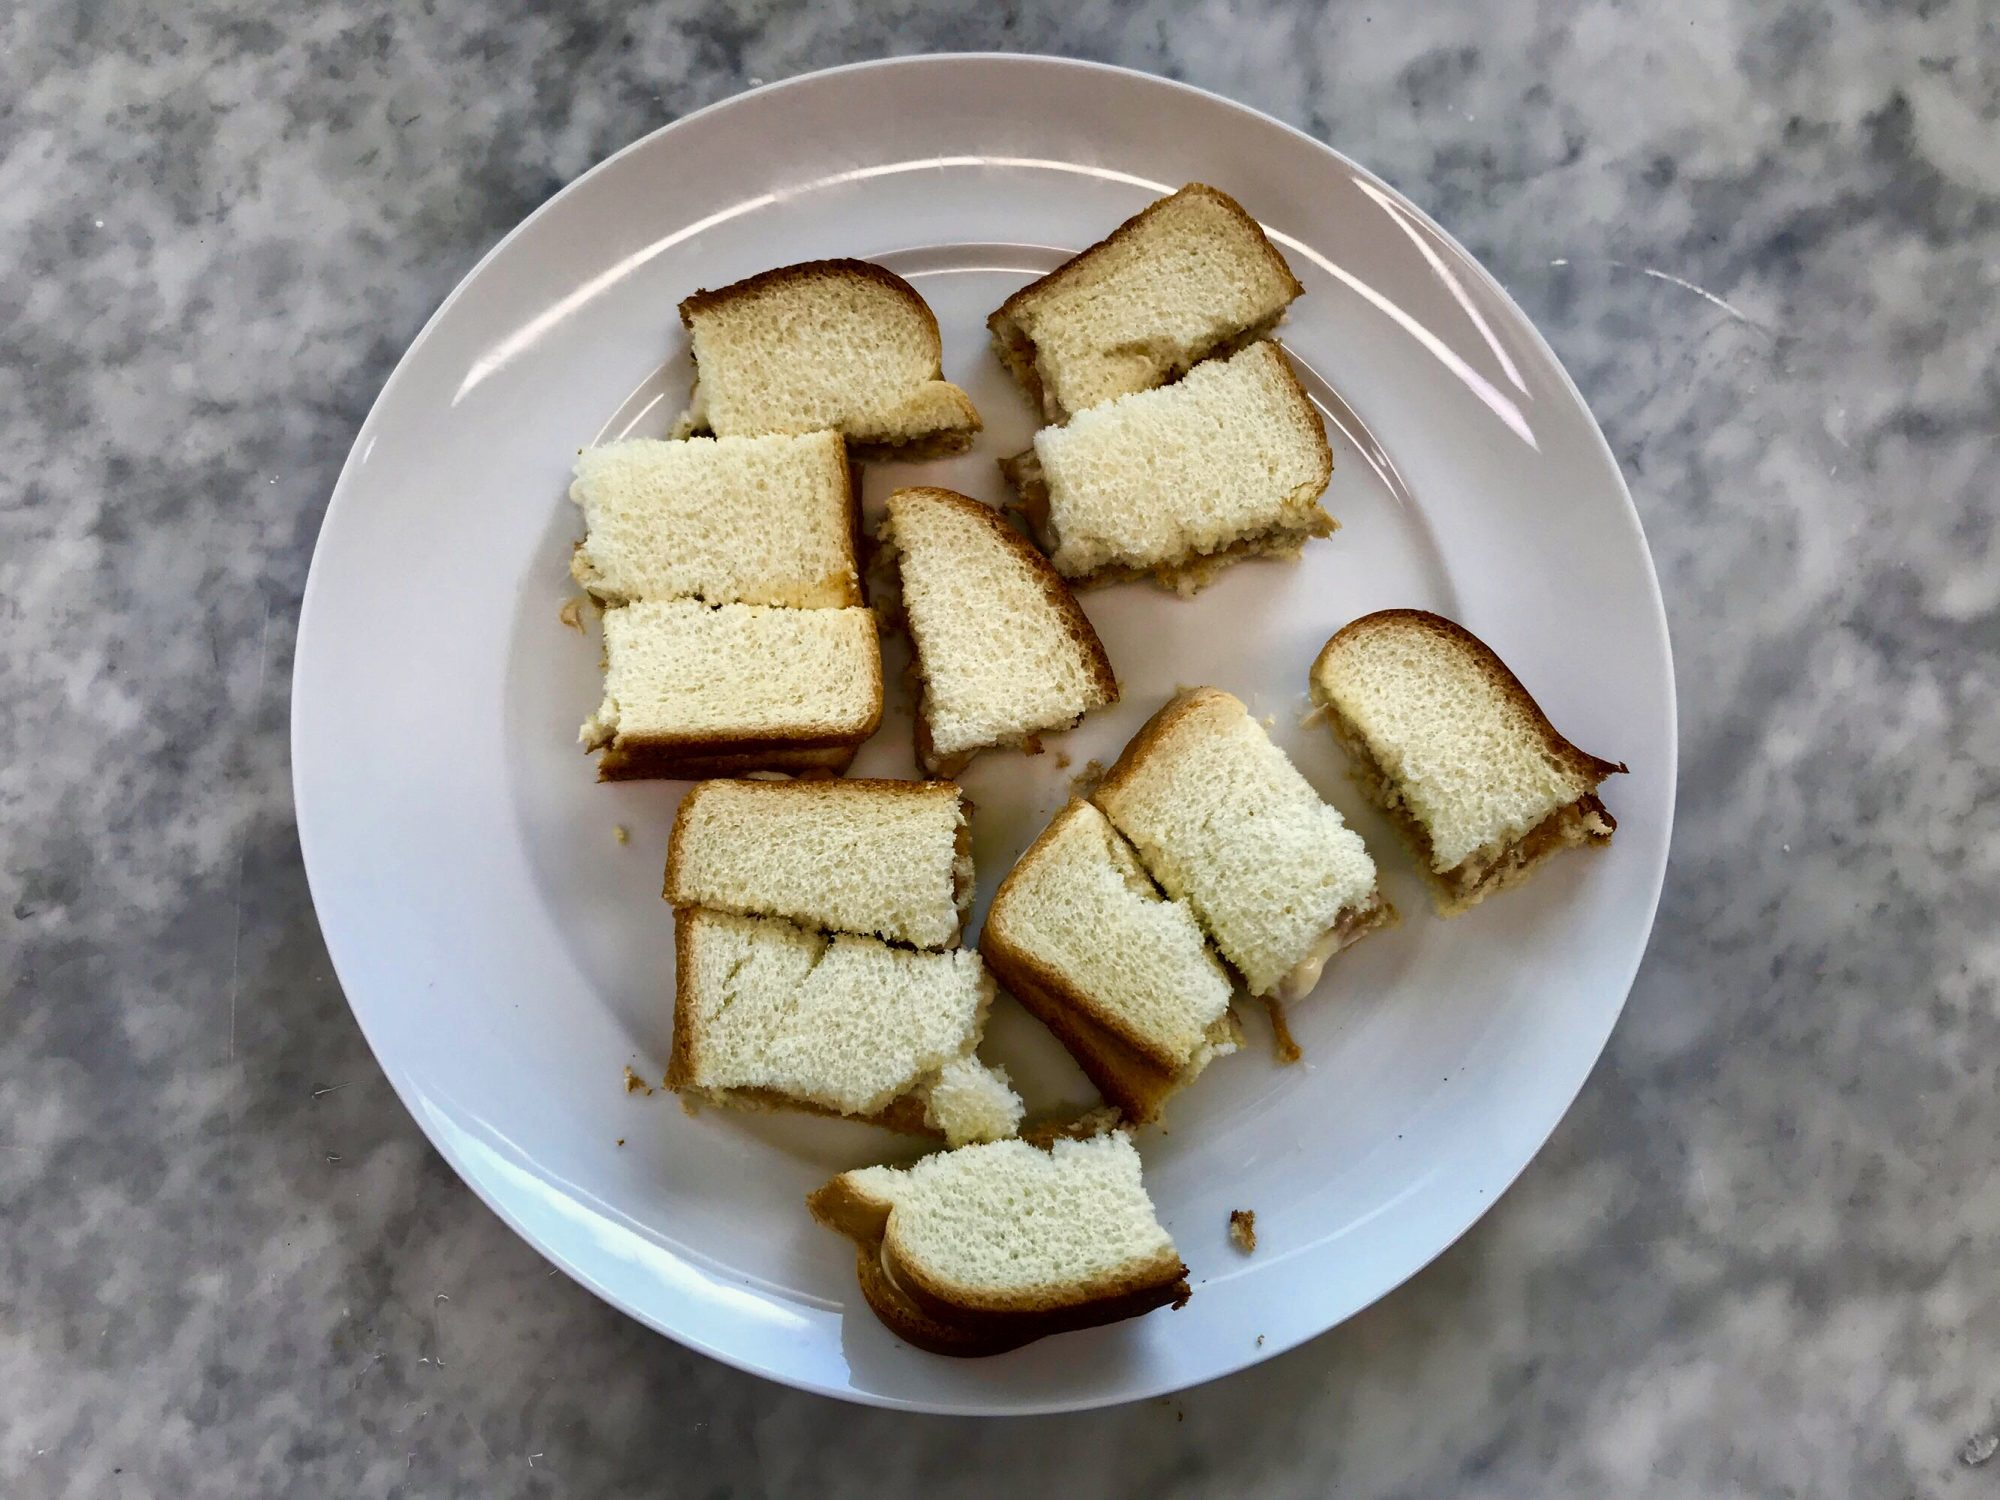 peanut butter and mayonnaise cut sandwich